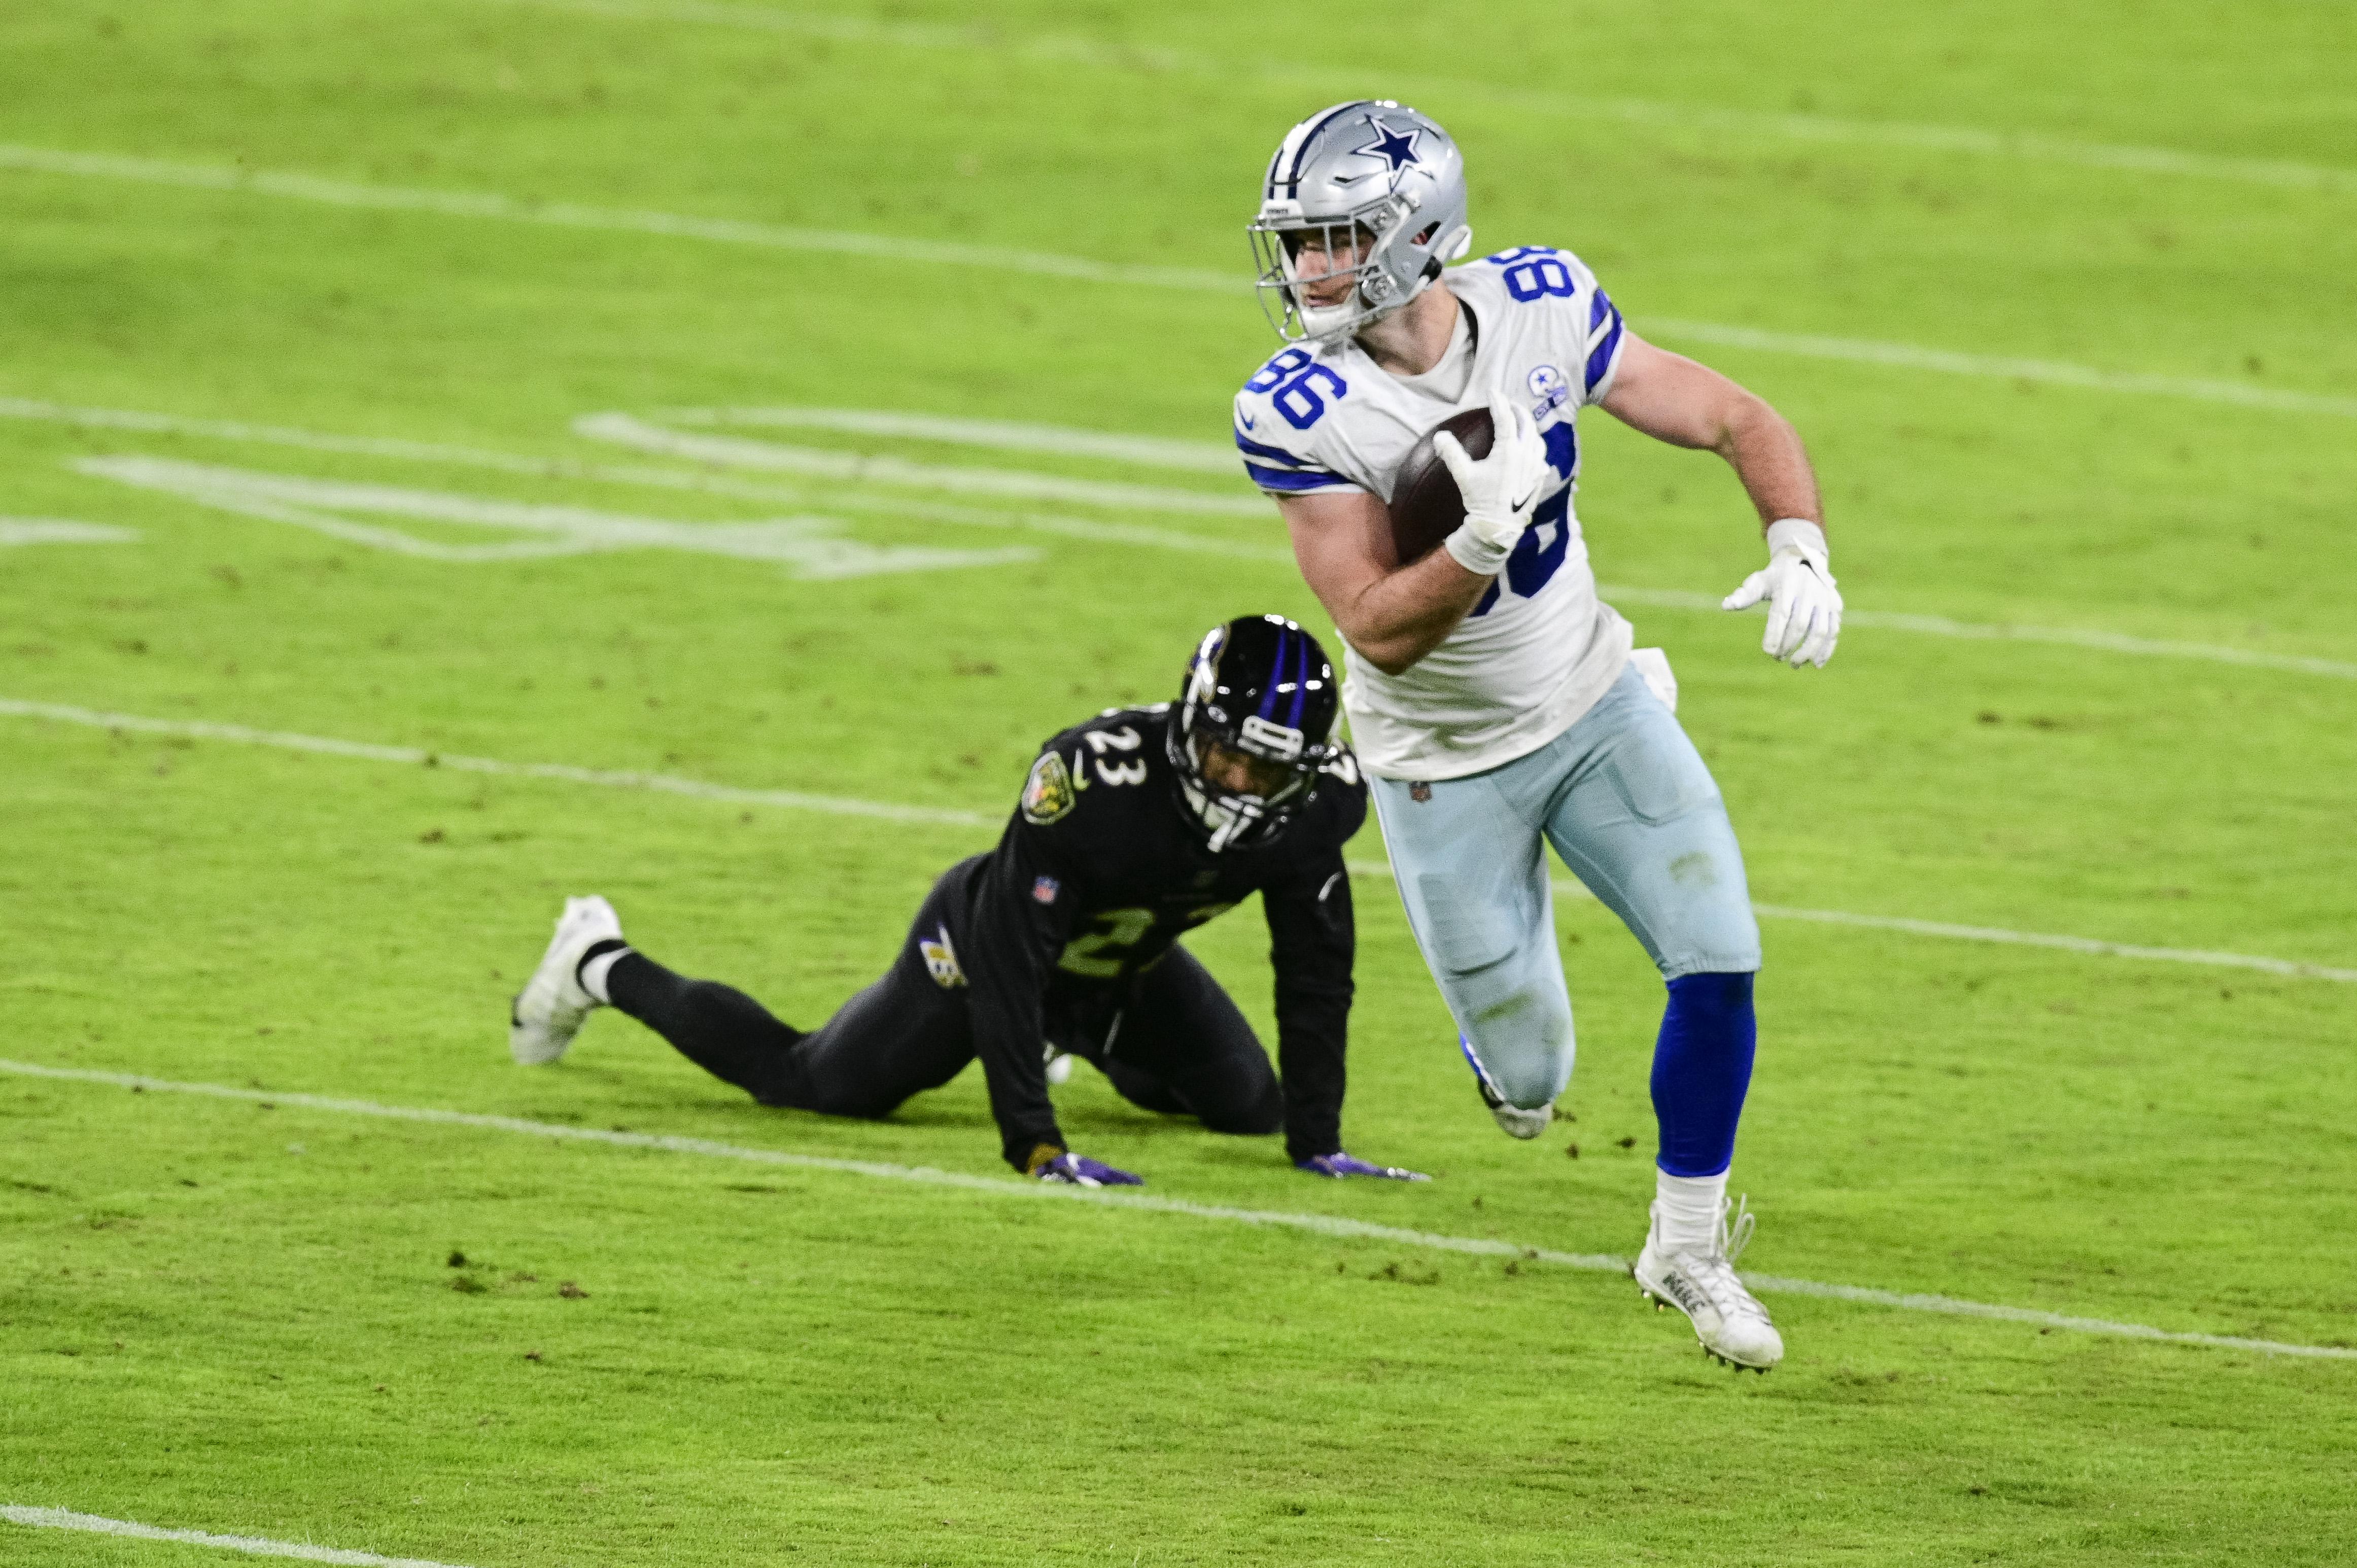 NFL: Dallas Cowboys at Baltimore Ravens